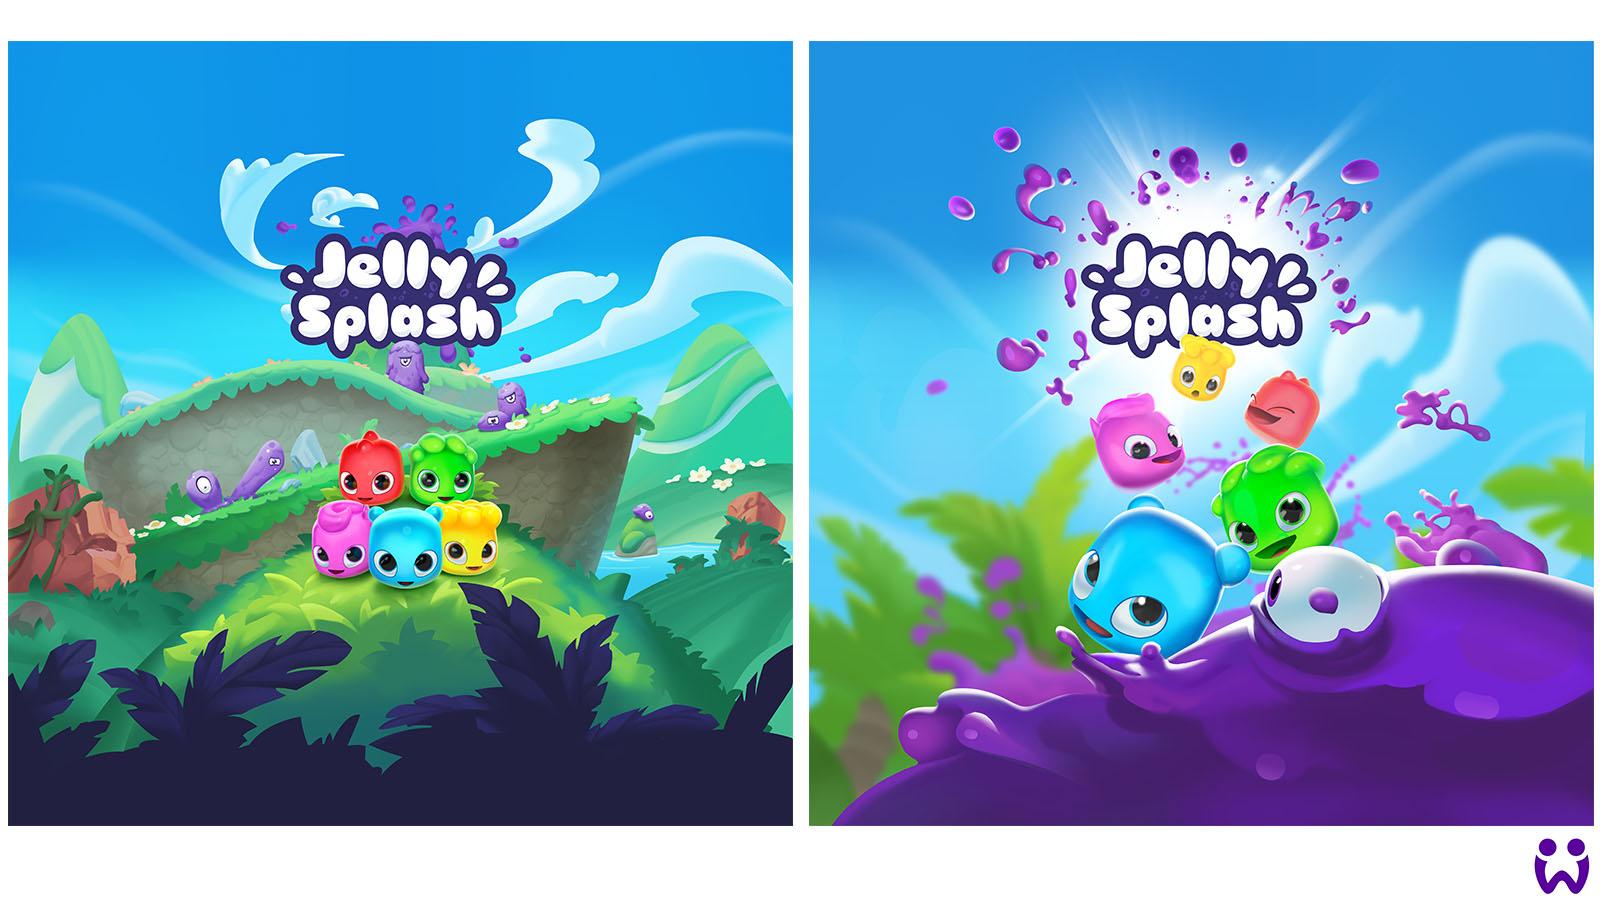 2 Marketingillustrationen für Wooga's Mobilegame Jelly Splash.